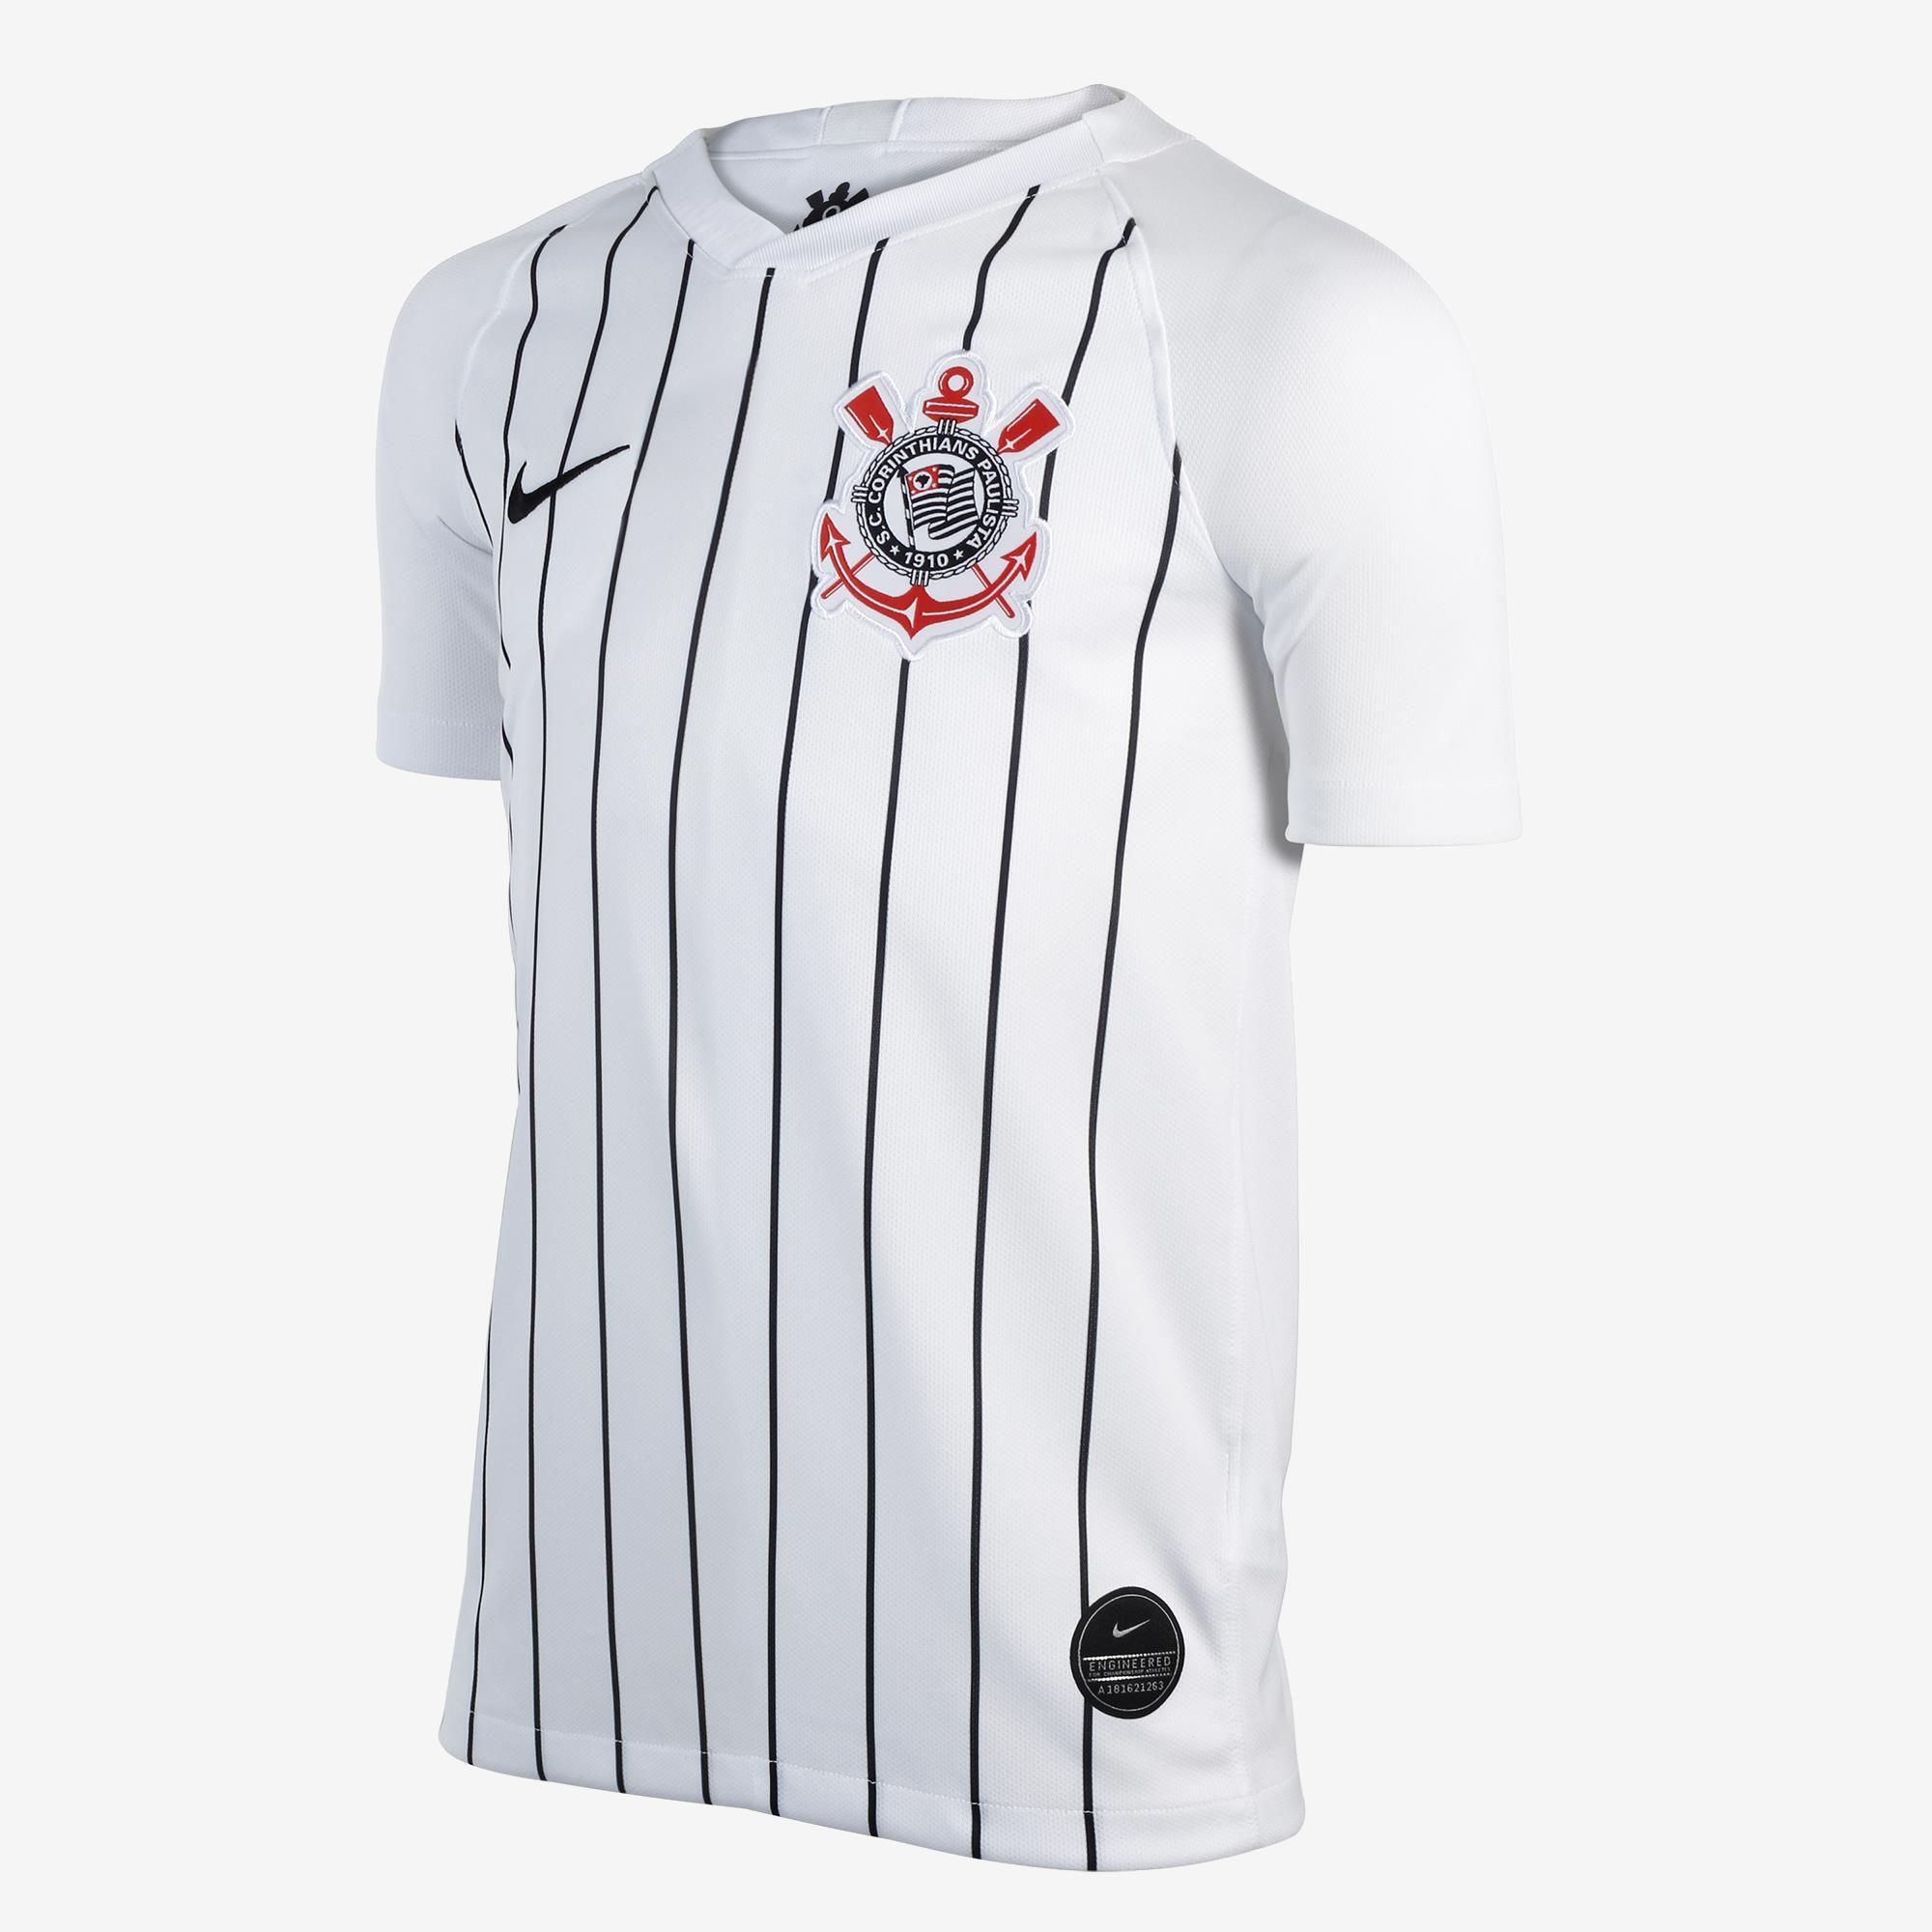 Camisa Corinthians I Nike 2019/20 Infantil